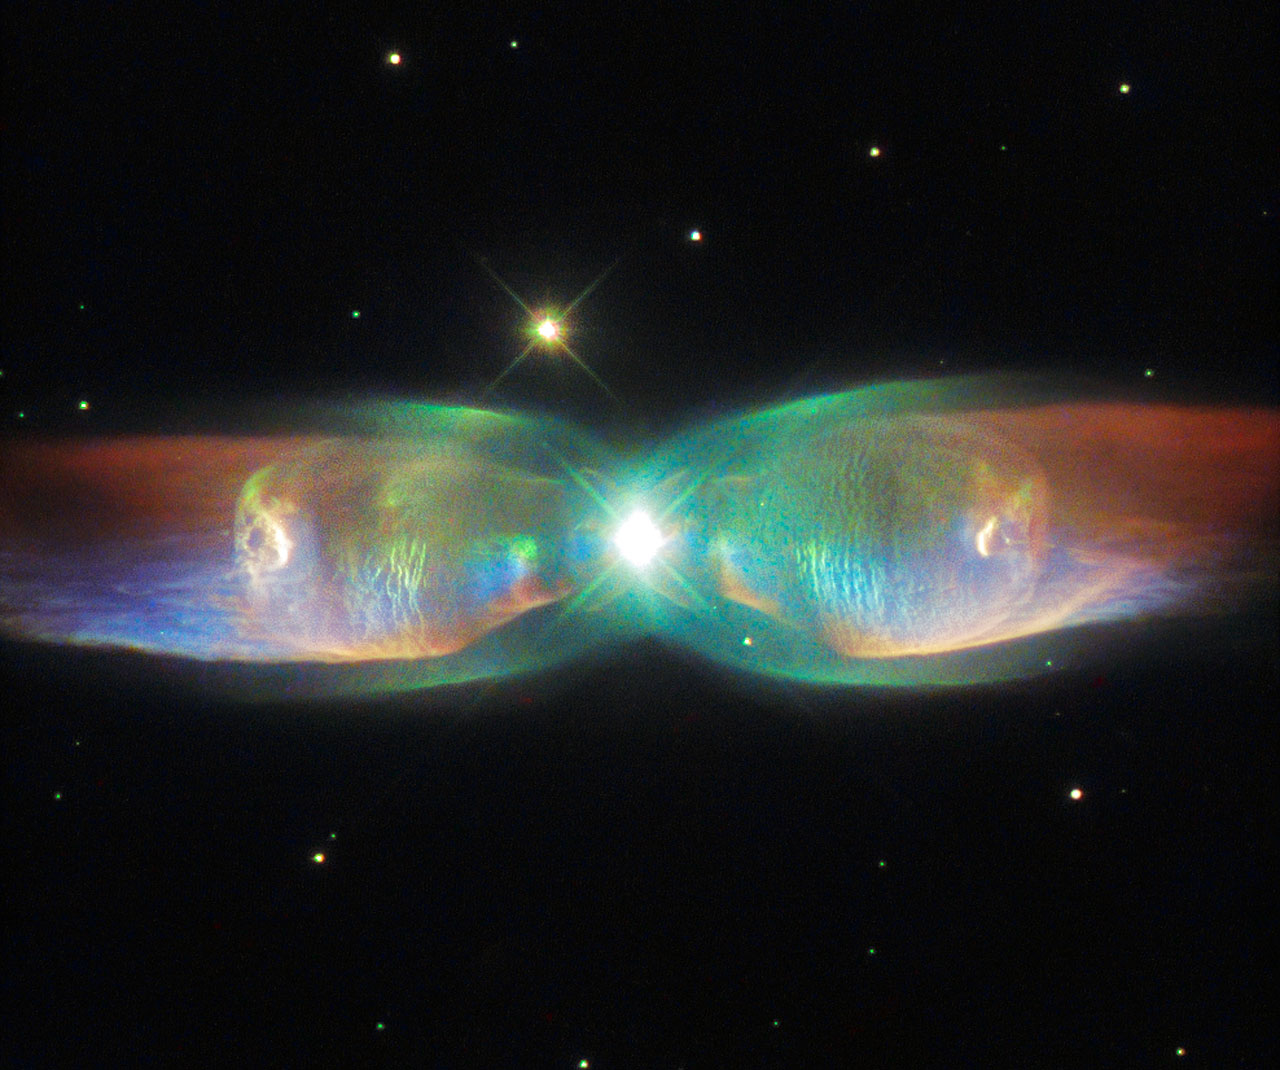 Hubble captures the Twin Jet Nebula • Earth com